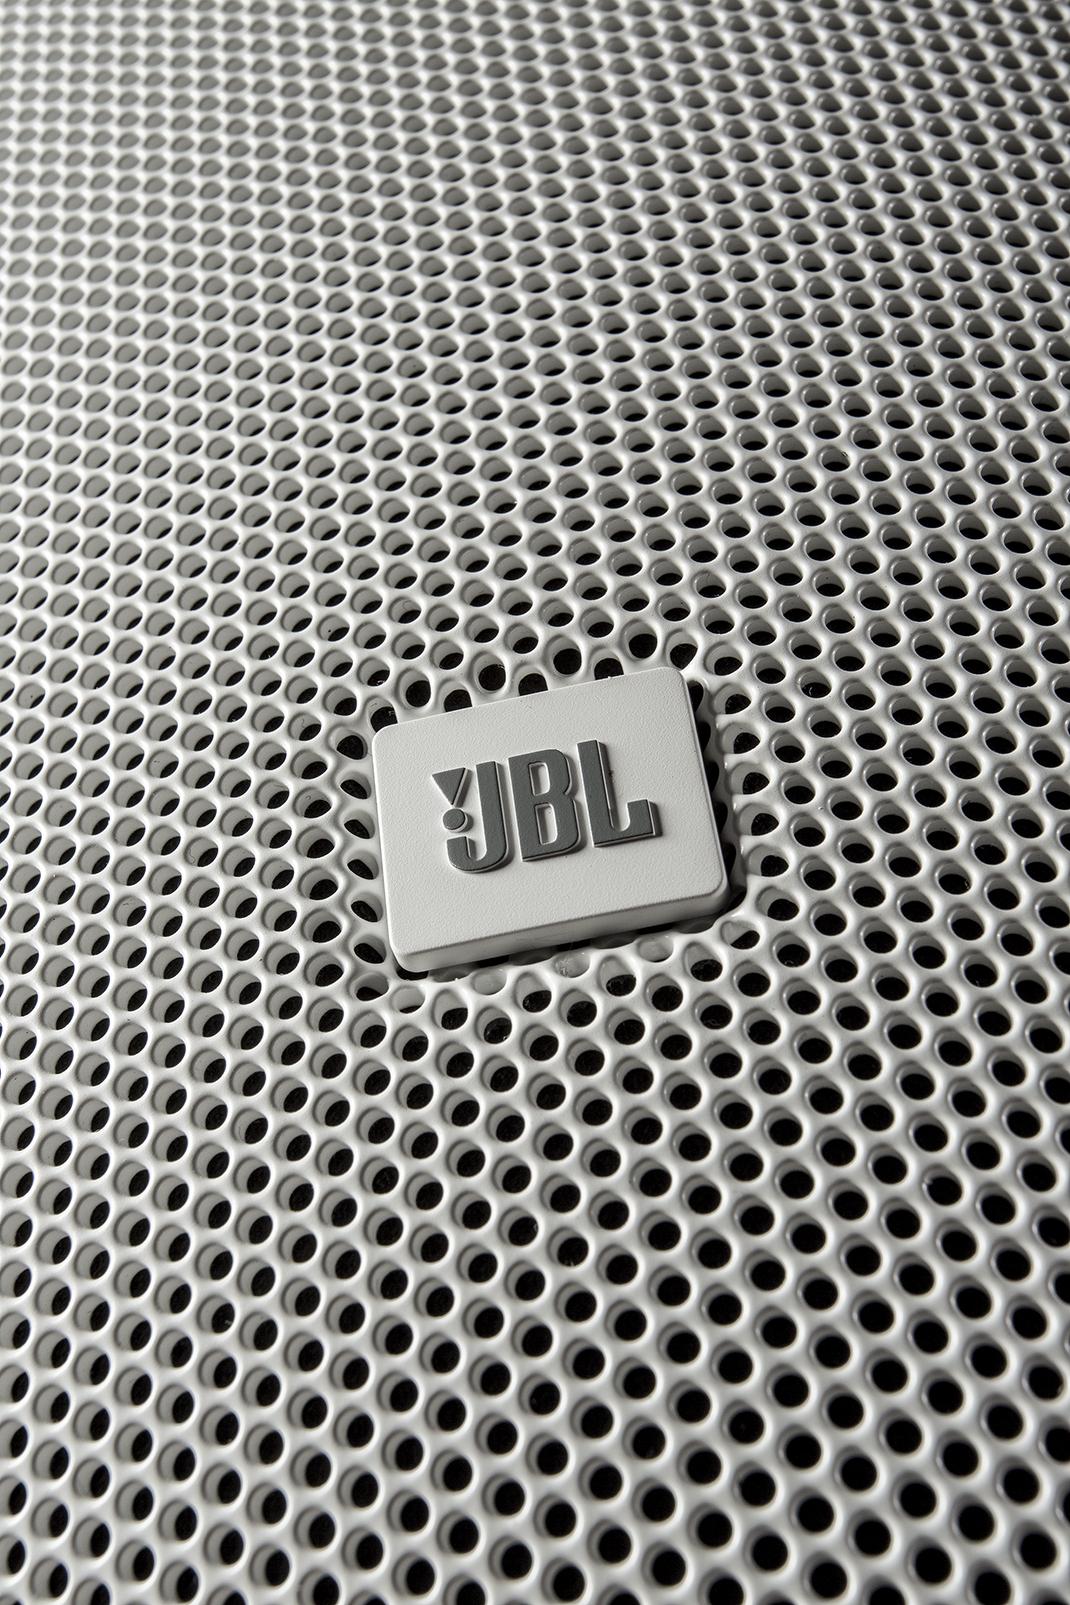 JBL CBT 1000 (B-Stock) - White - Constant Beamwidth Technology ™ Adjustable Coverage Line Array Column - Detailshot 3